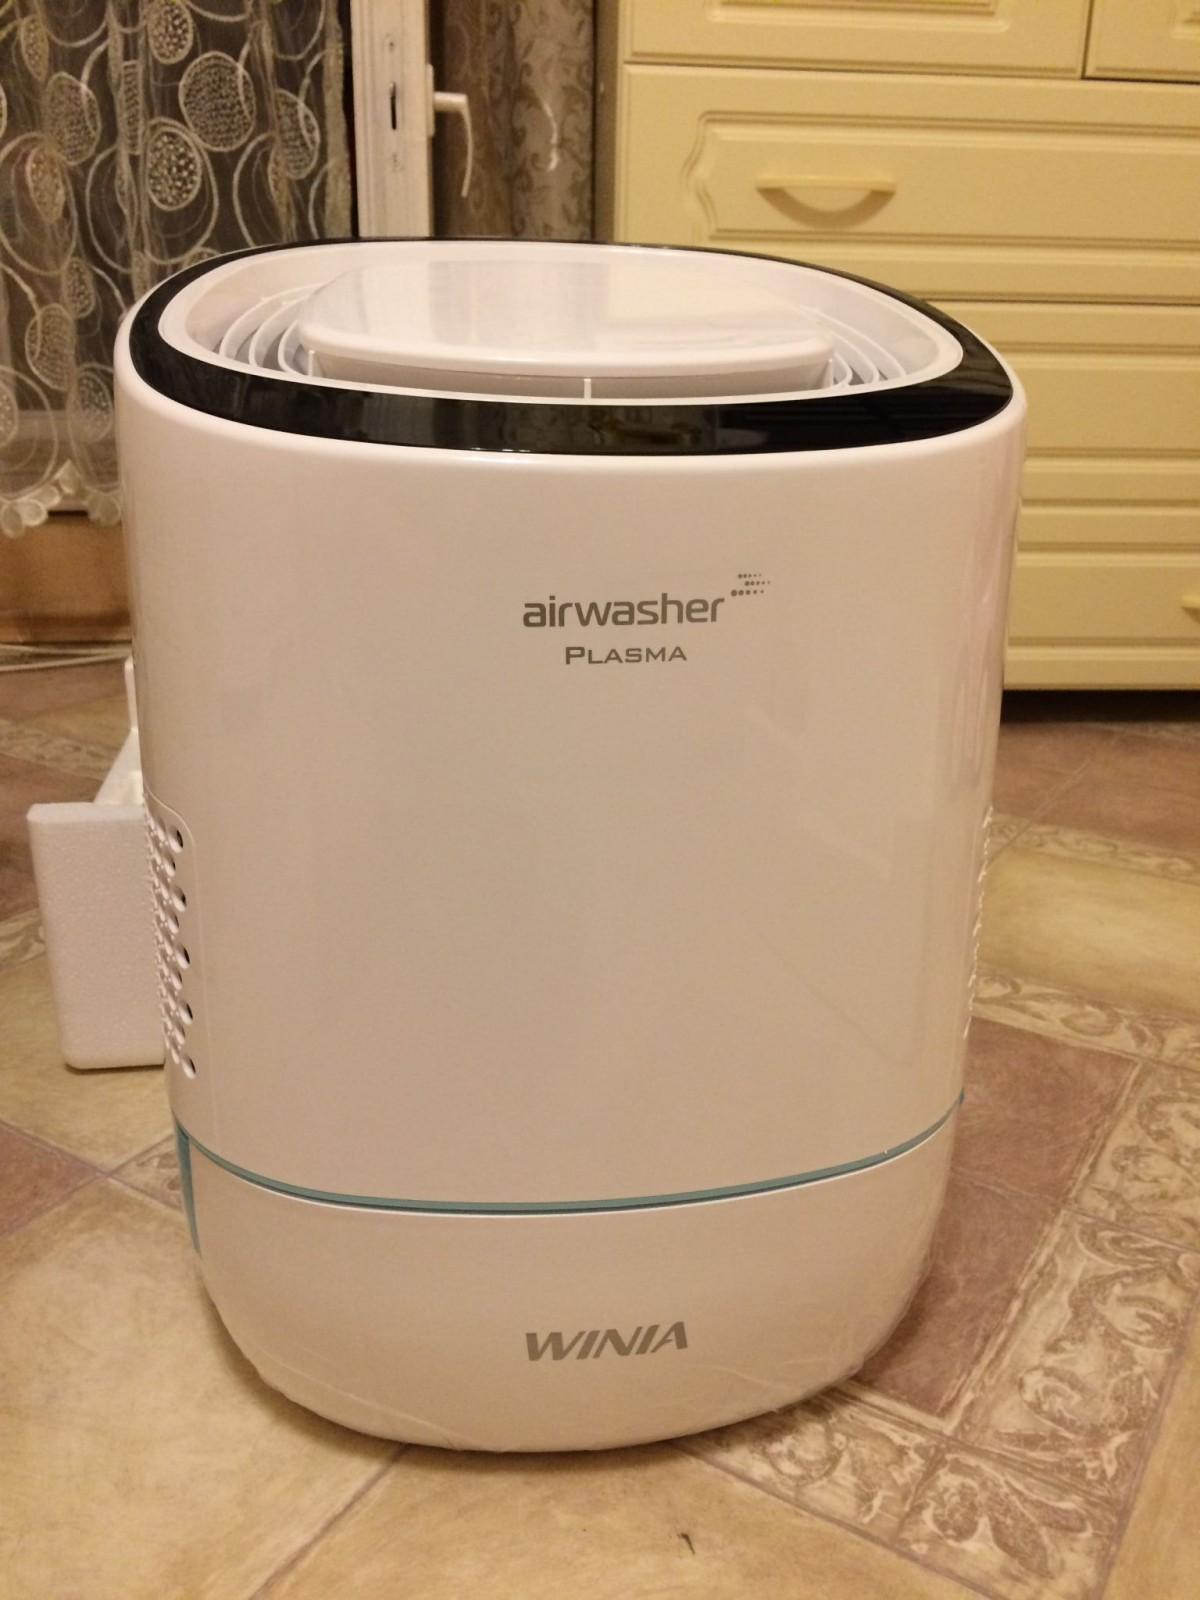 Winia AWI-40